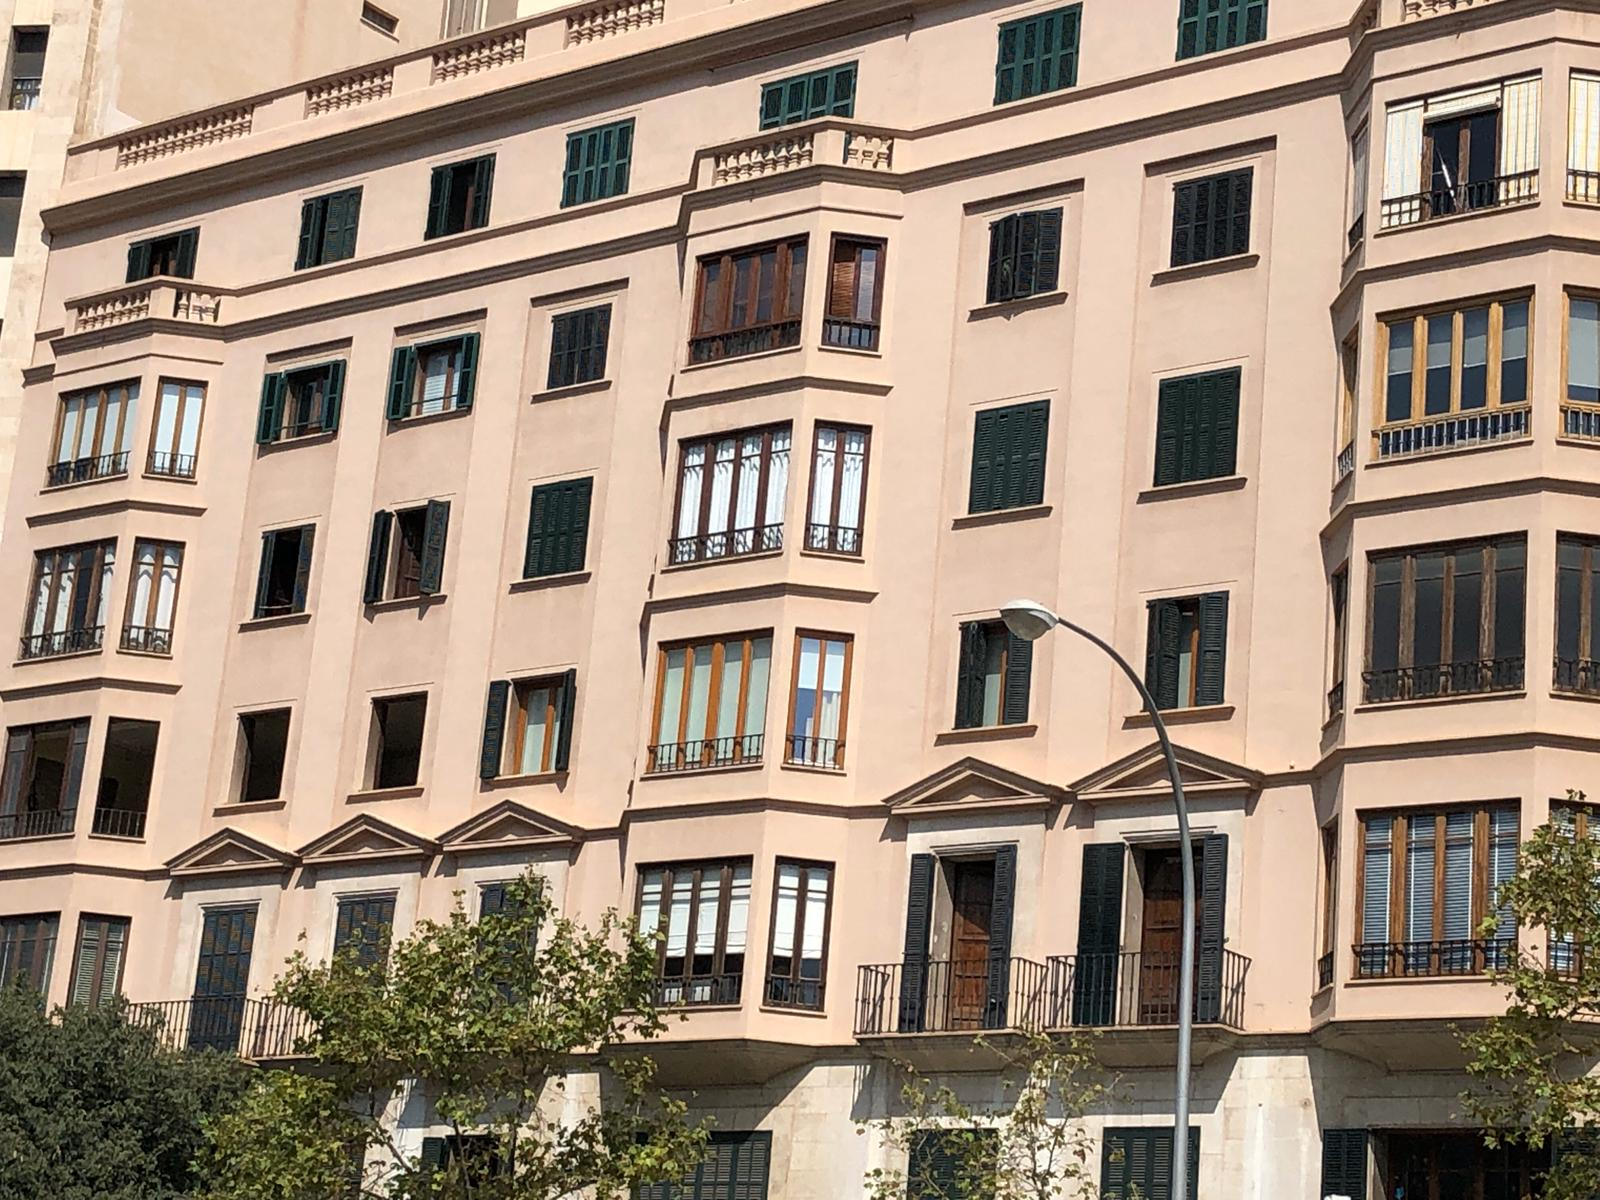 Imagen 1 Ático en venta en Palma / Bons Aires - Avenida Comte de Sallent